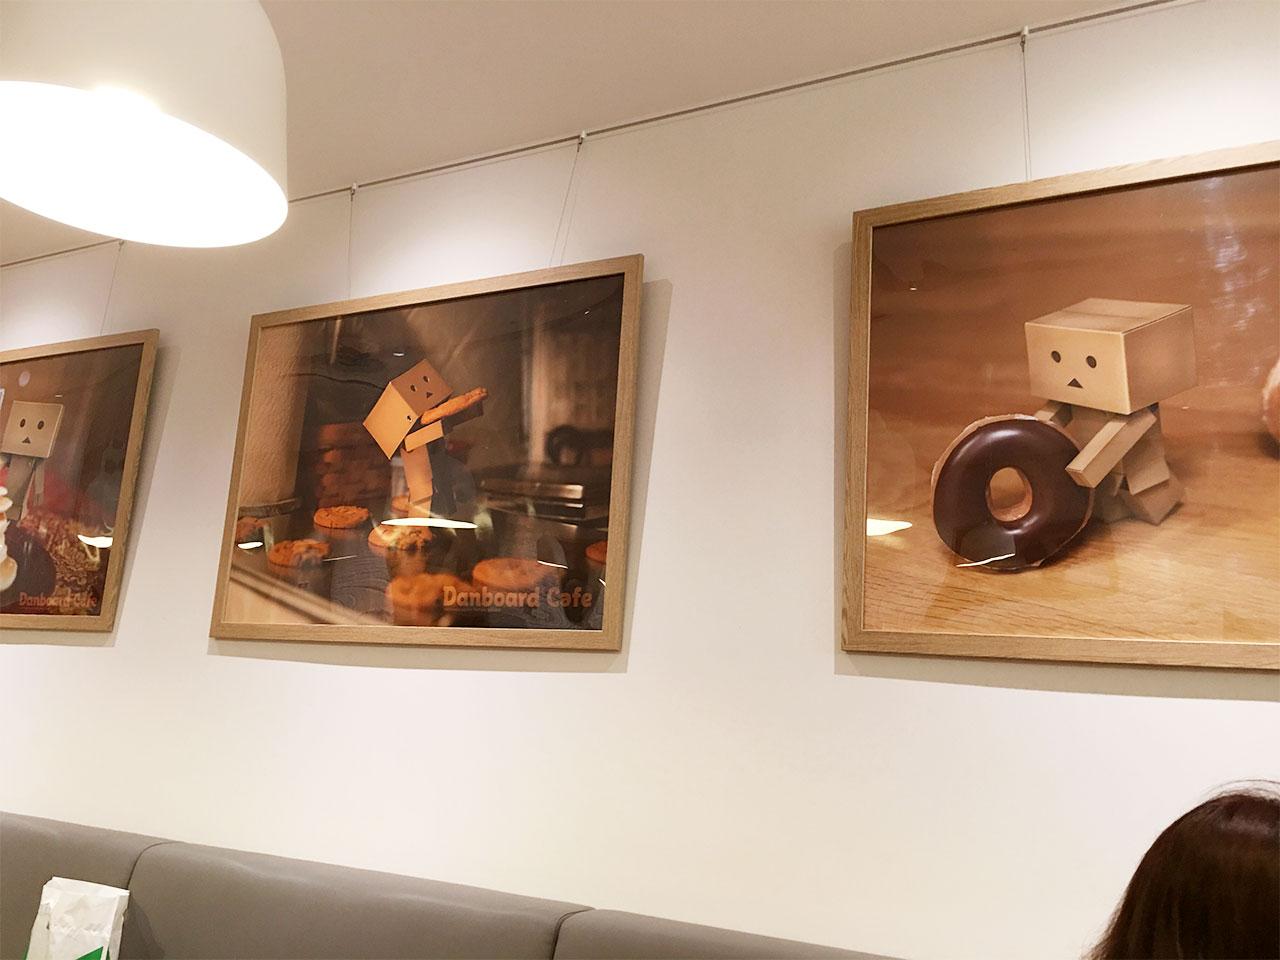 tachikawa-danboard-cafe-wall01